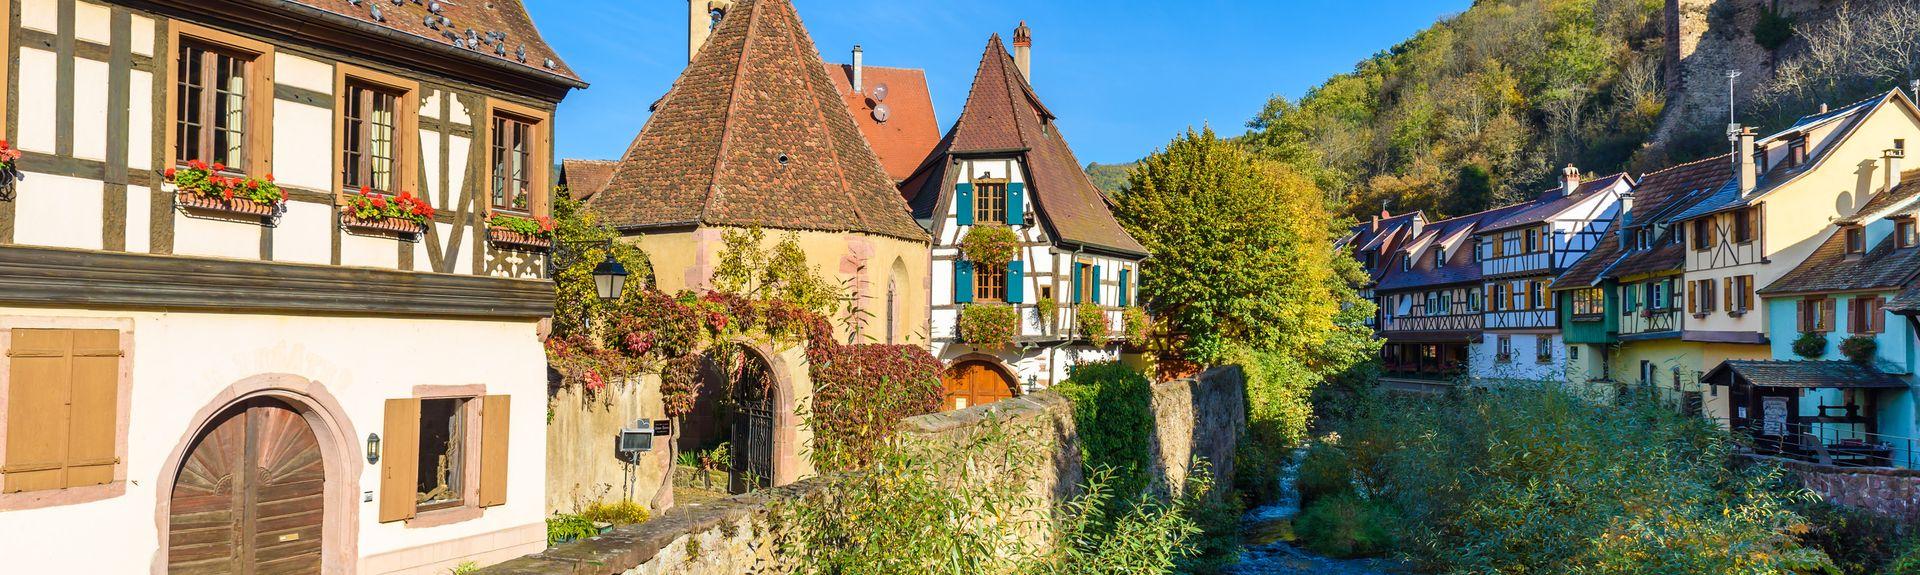 Kaysersberg-Vignoble, Haut-Rhin (departement), Frankrijk